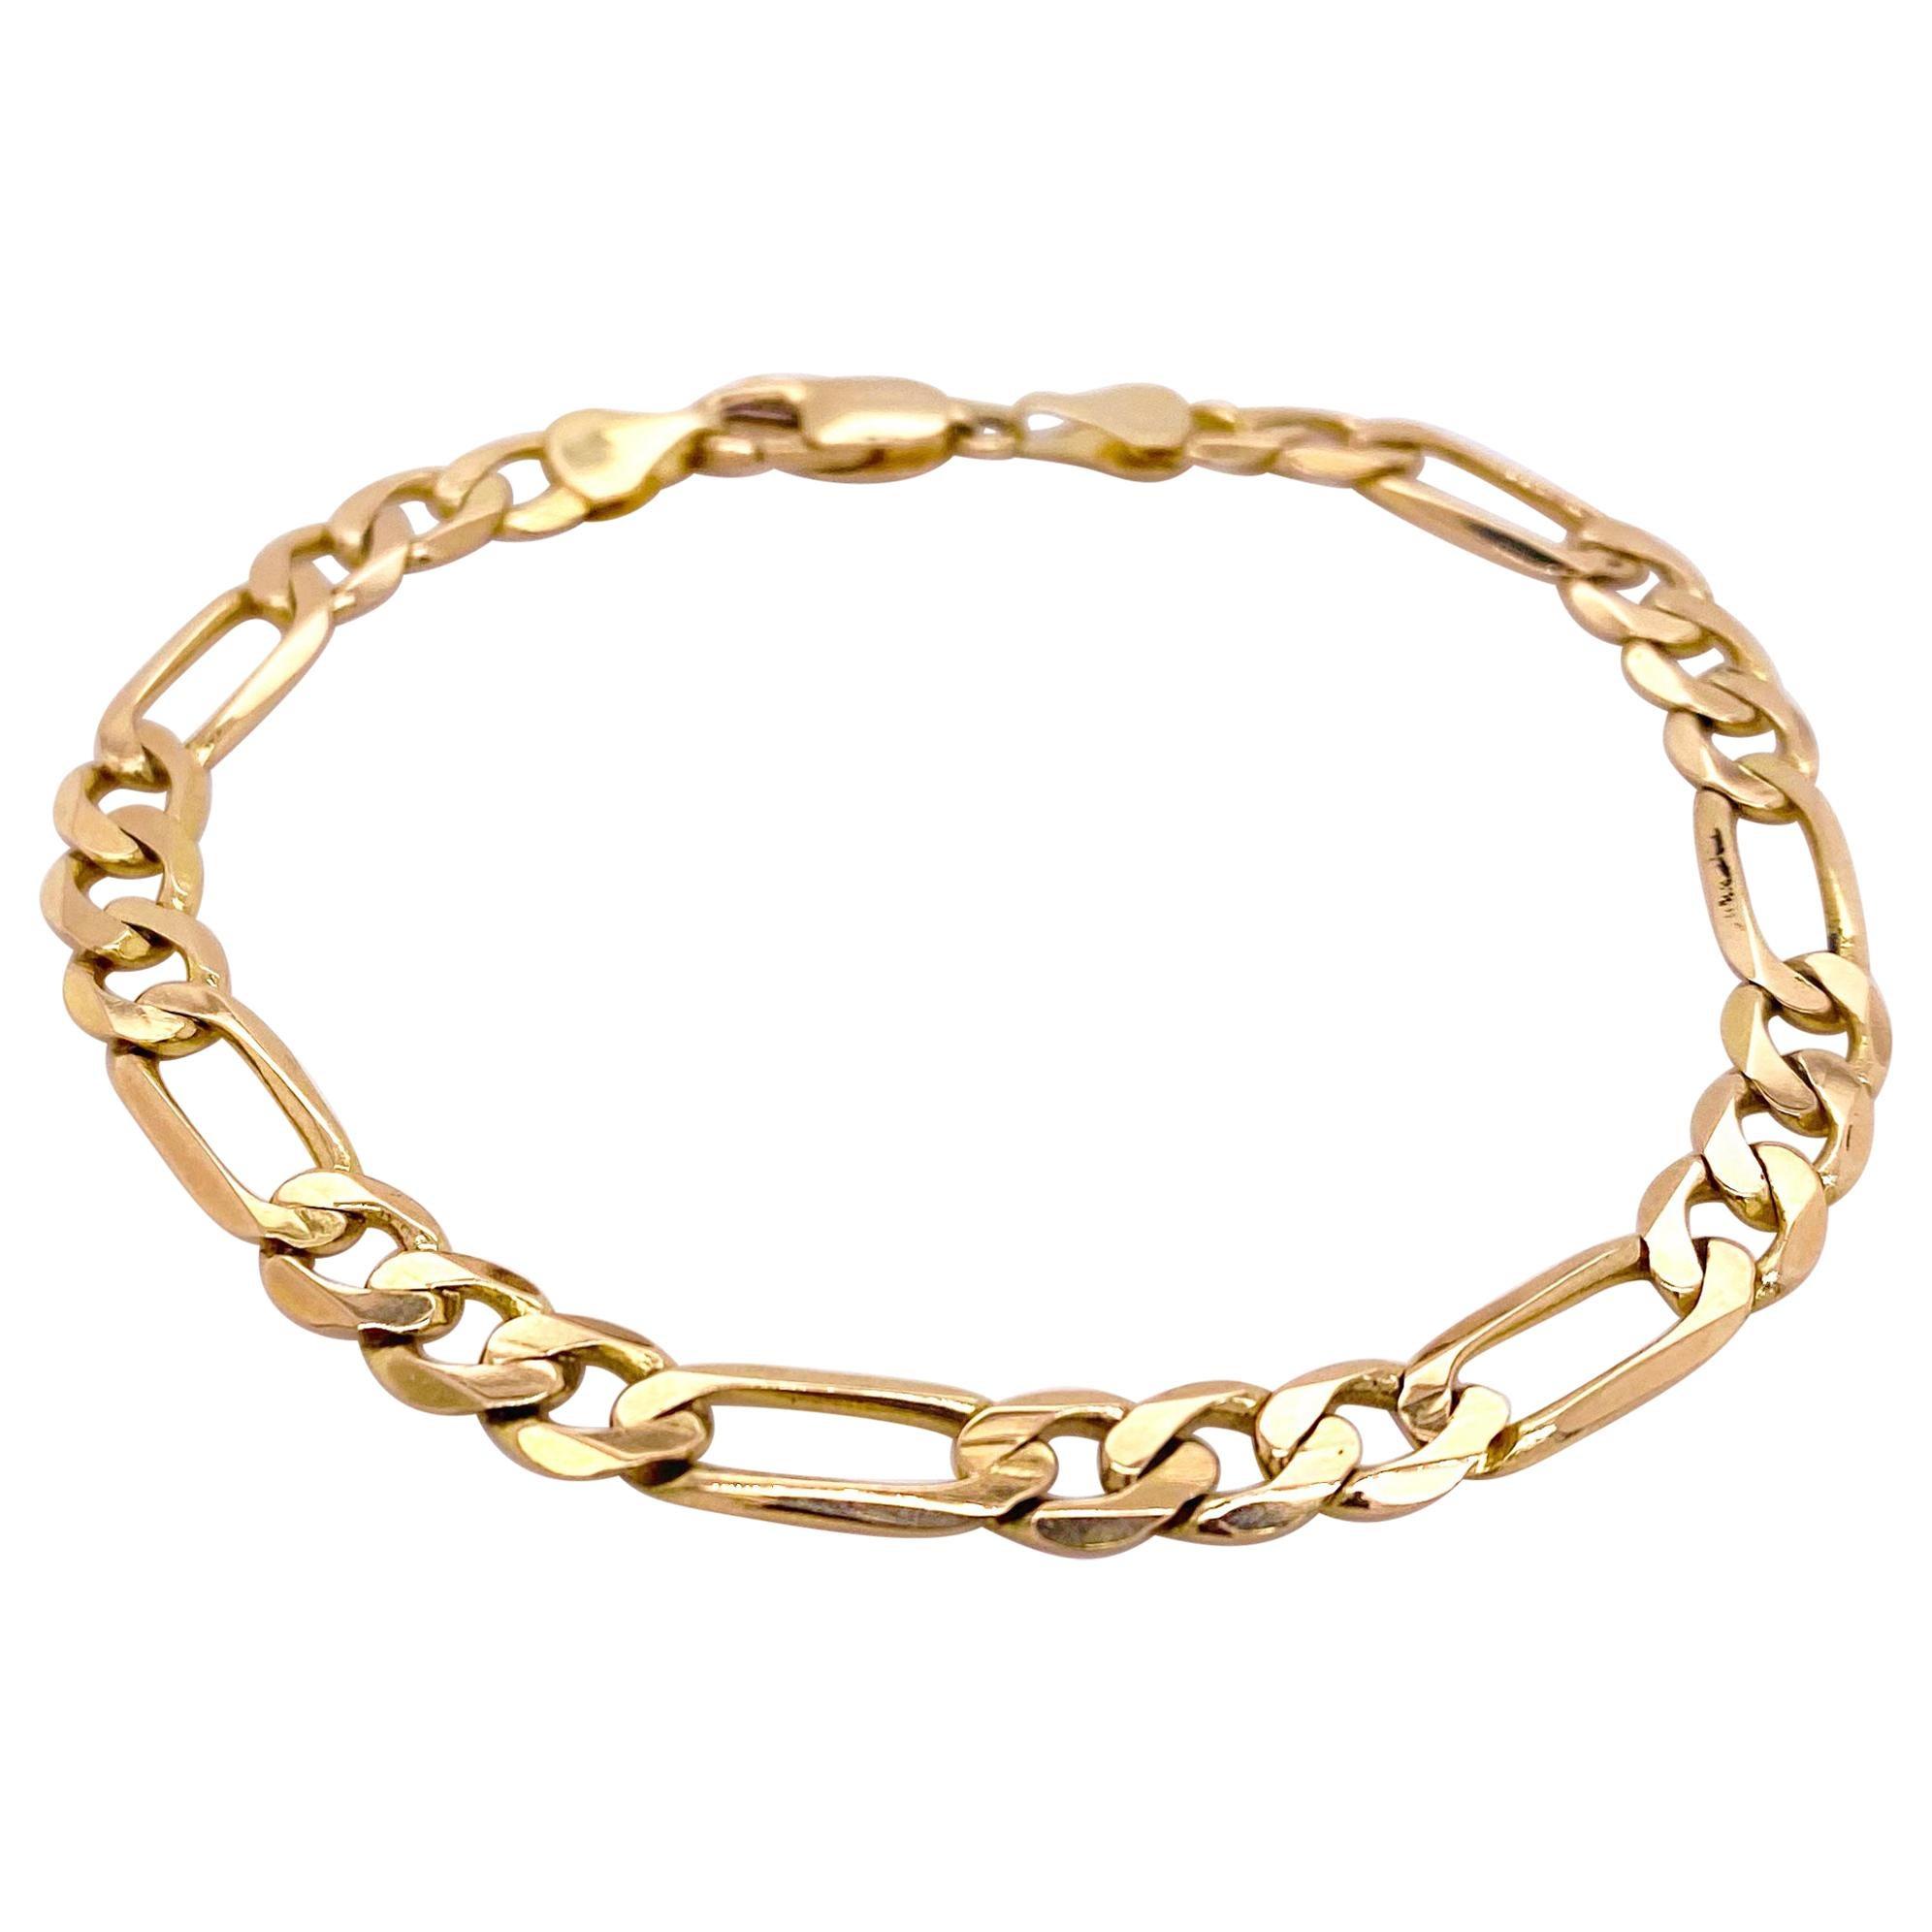 Gold Figaro Bracelet, 14 Karat Yellow Gold Charm Bracelet